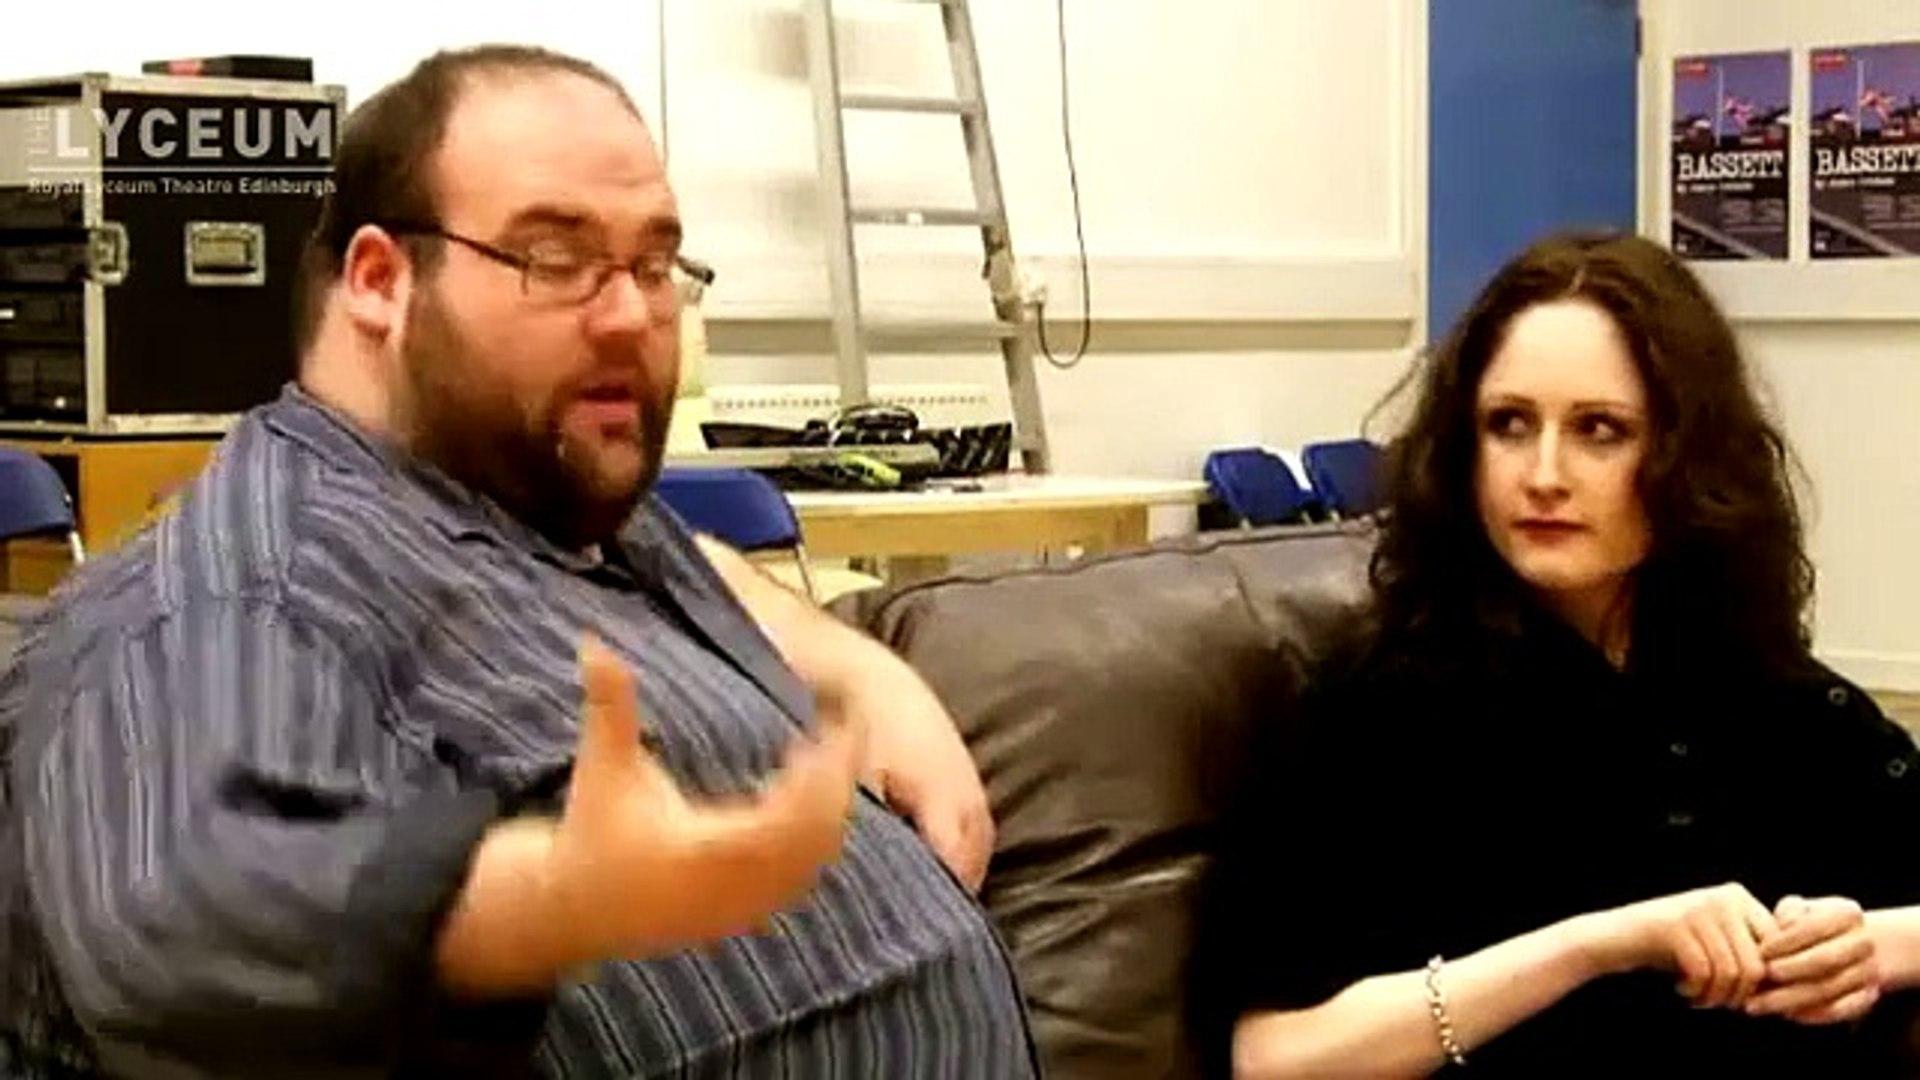 Bassett - interviews and rehearsals